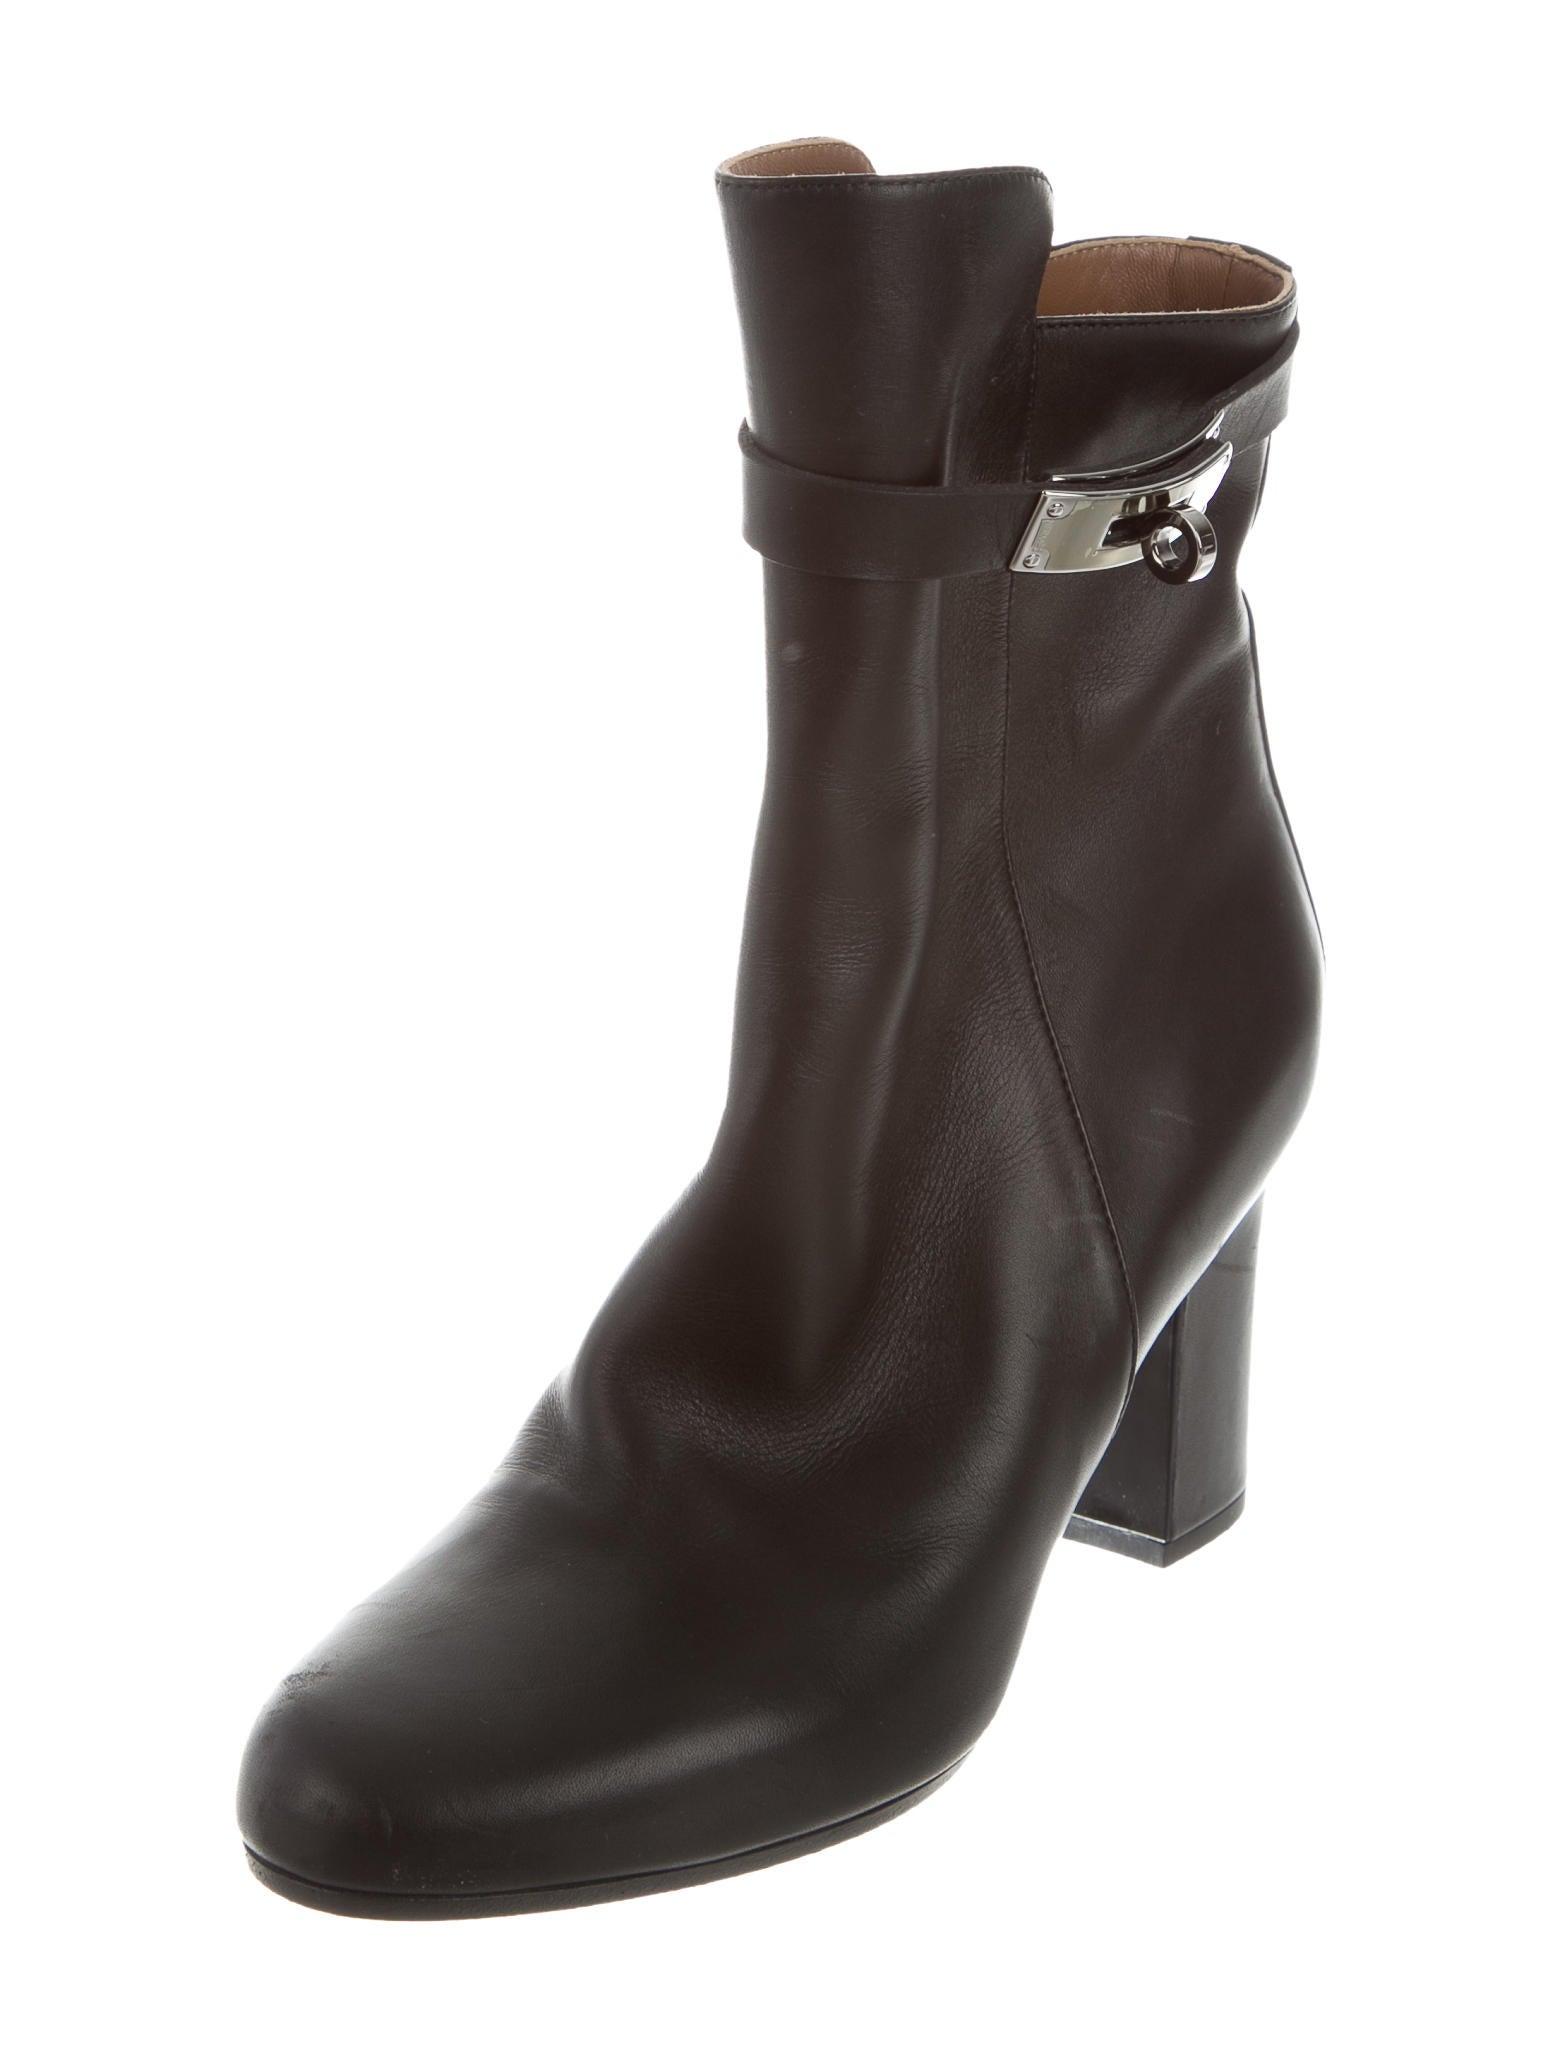 hermes women shoes - photo #37